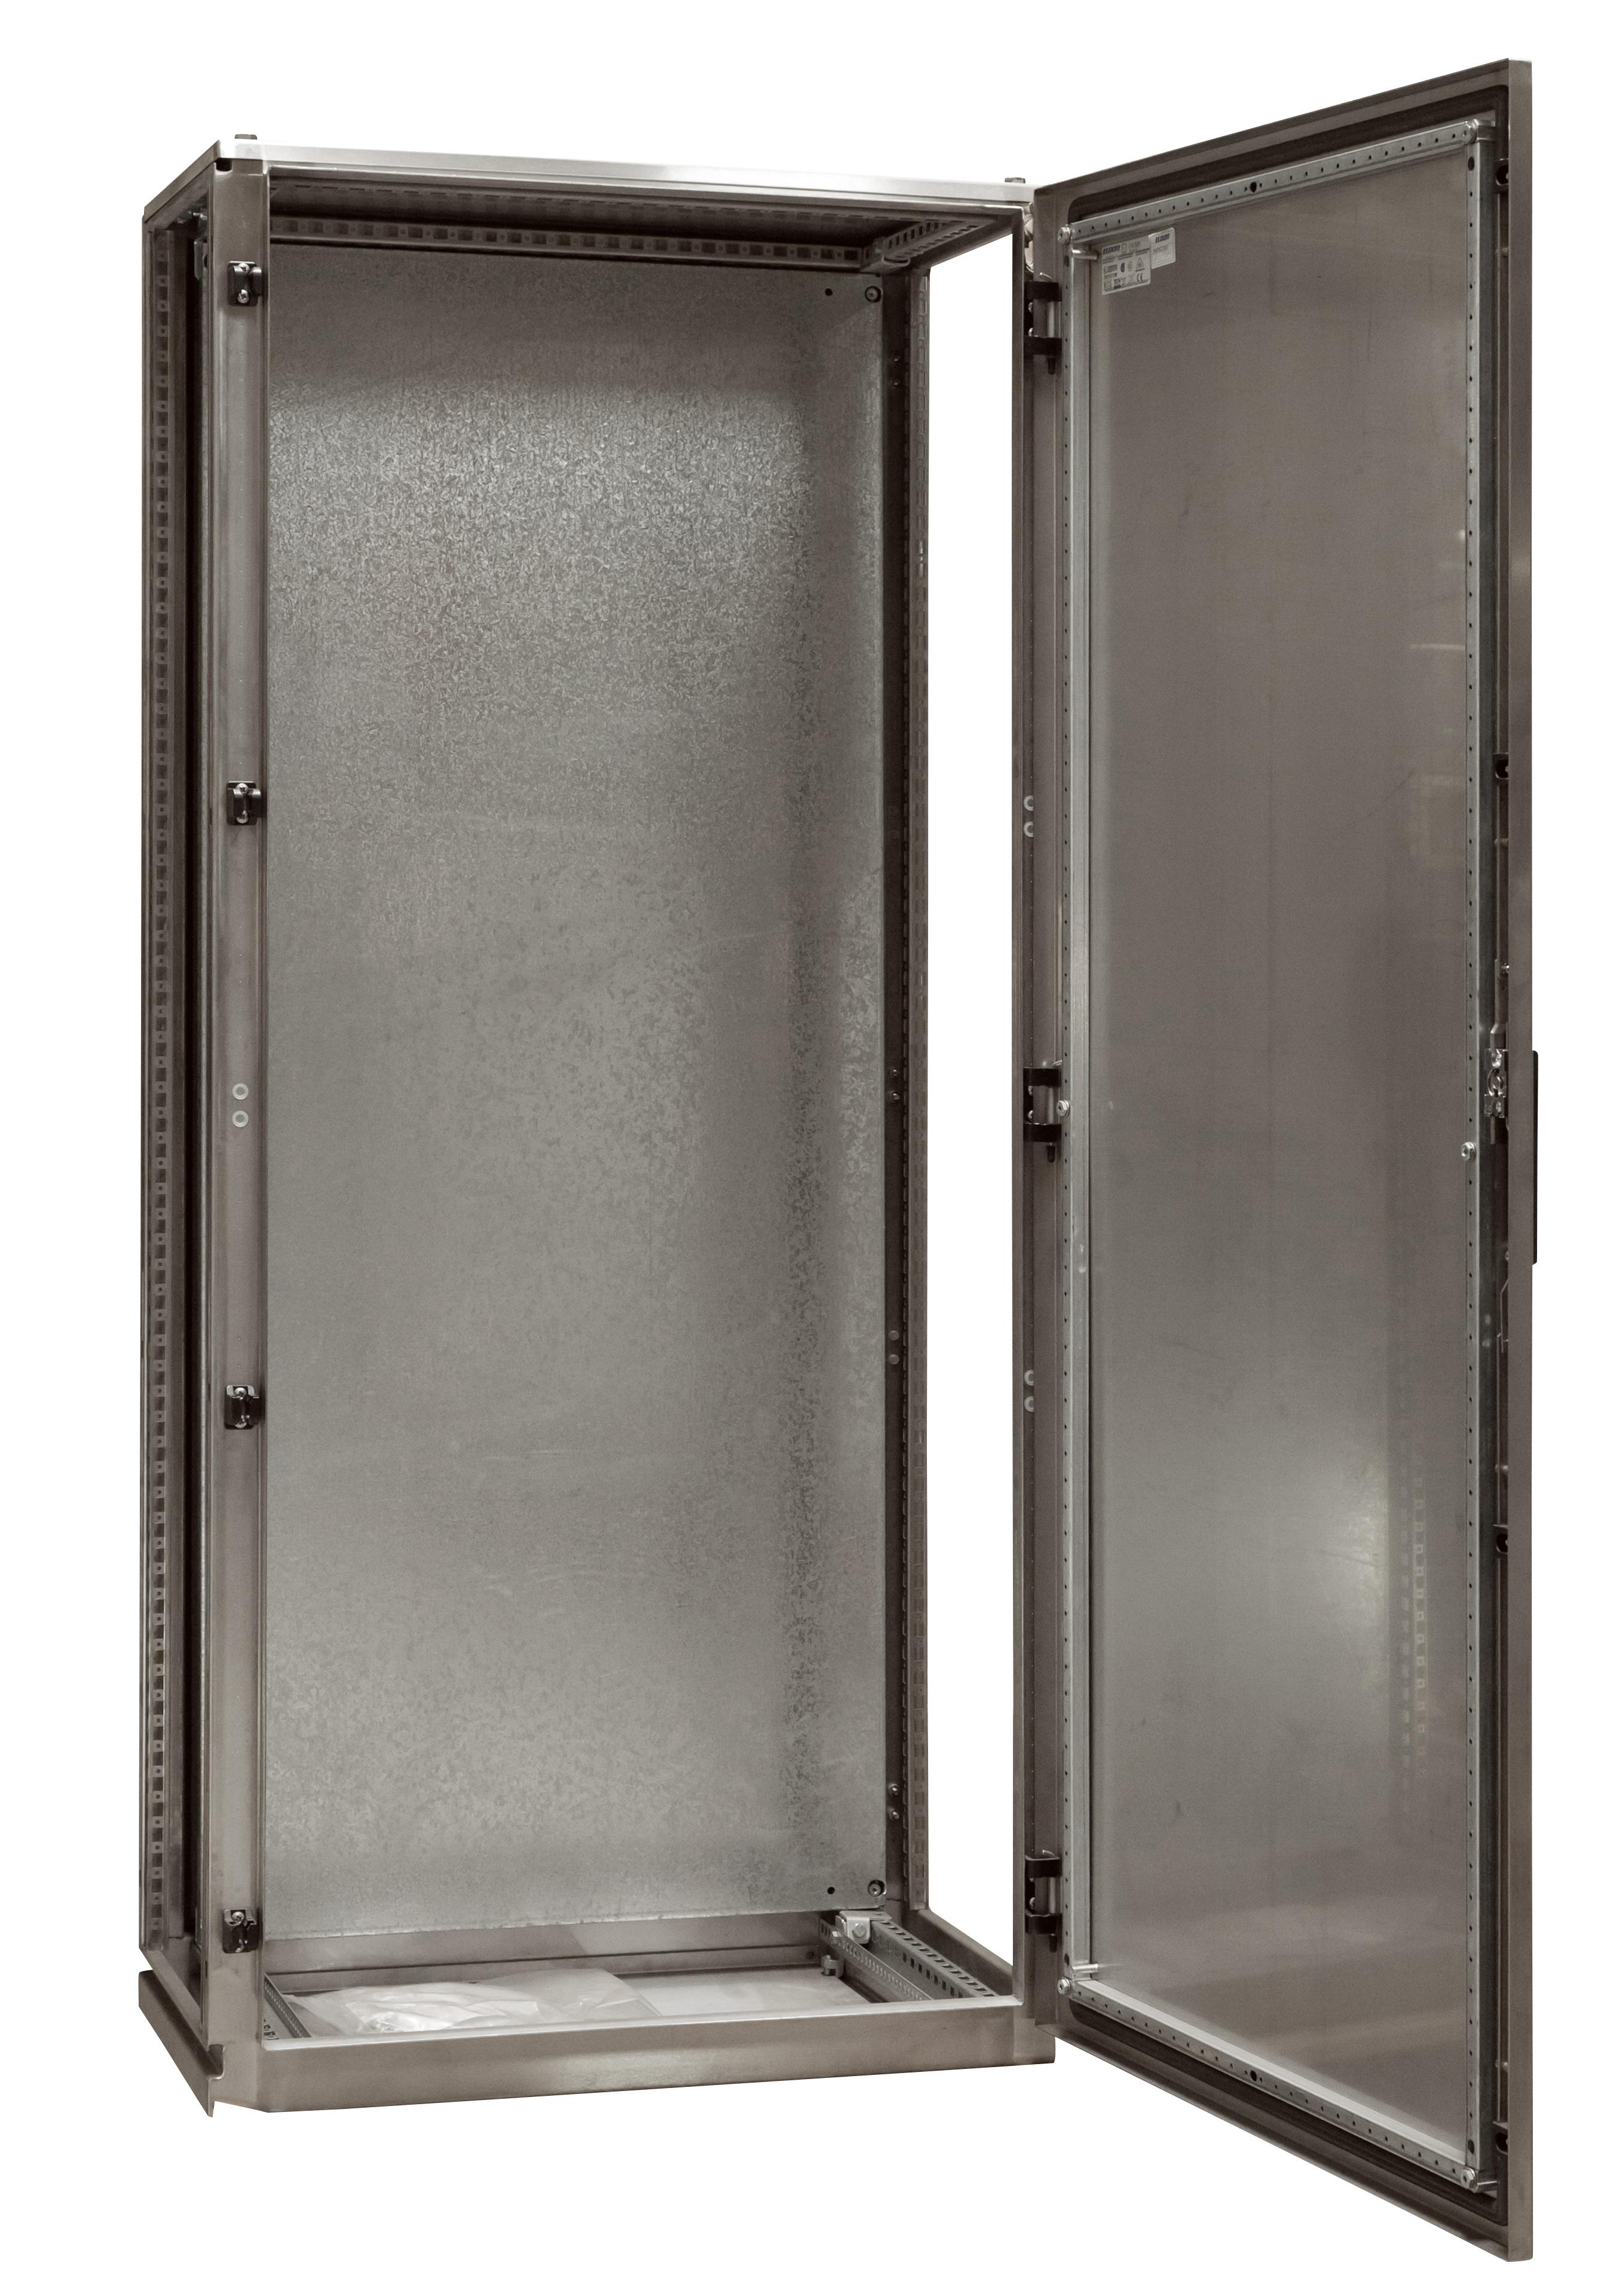 1 Stk Anreihschrank Edelstahl 1-türig, 1800x800x500mm, AISI 304L ASR188050-